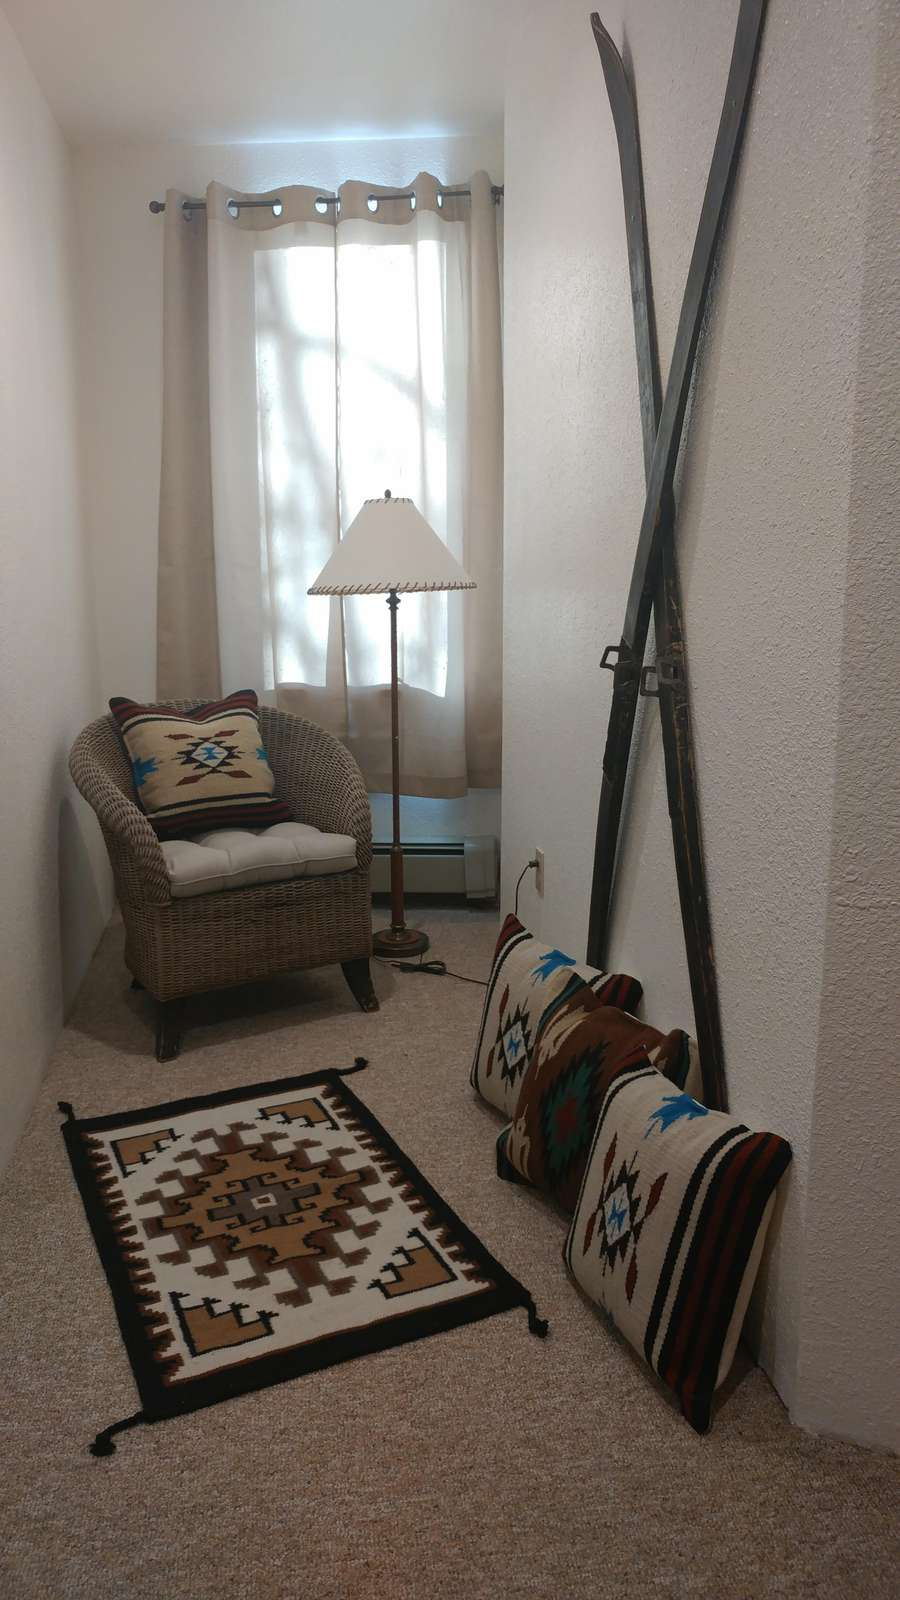 Hallway next to #305 condo